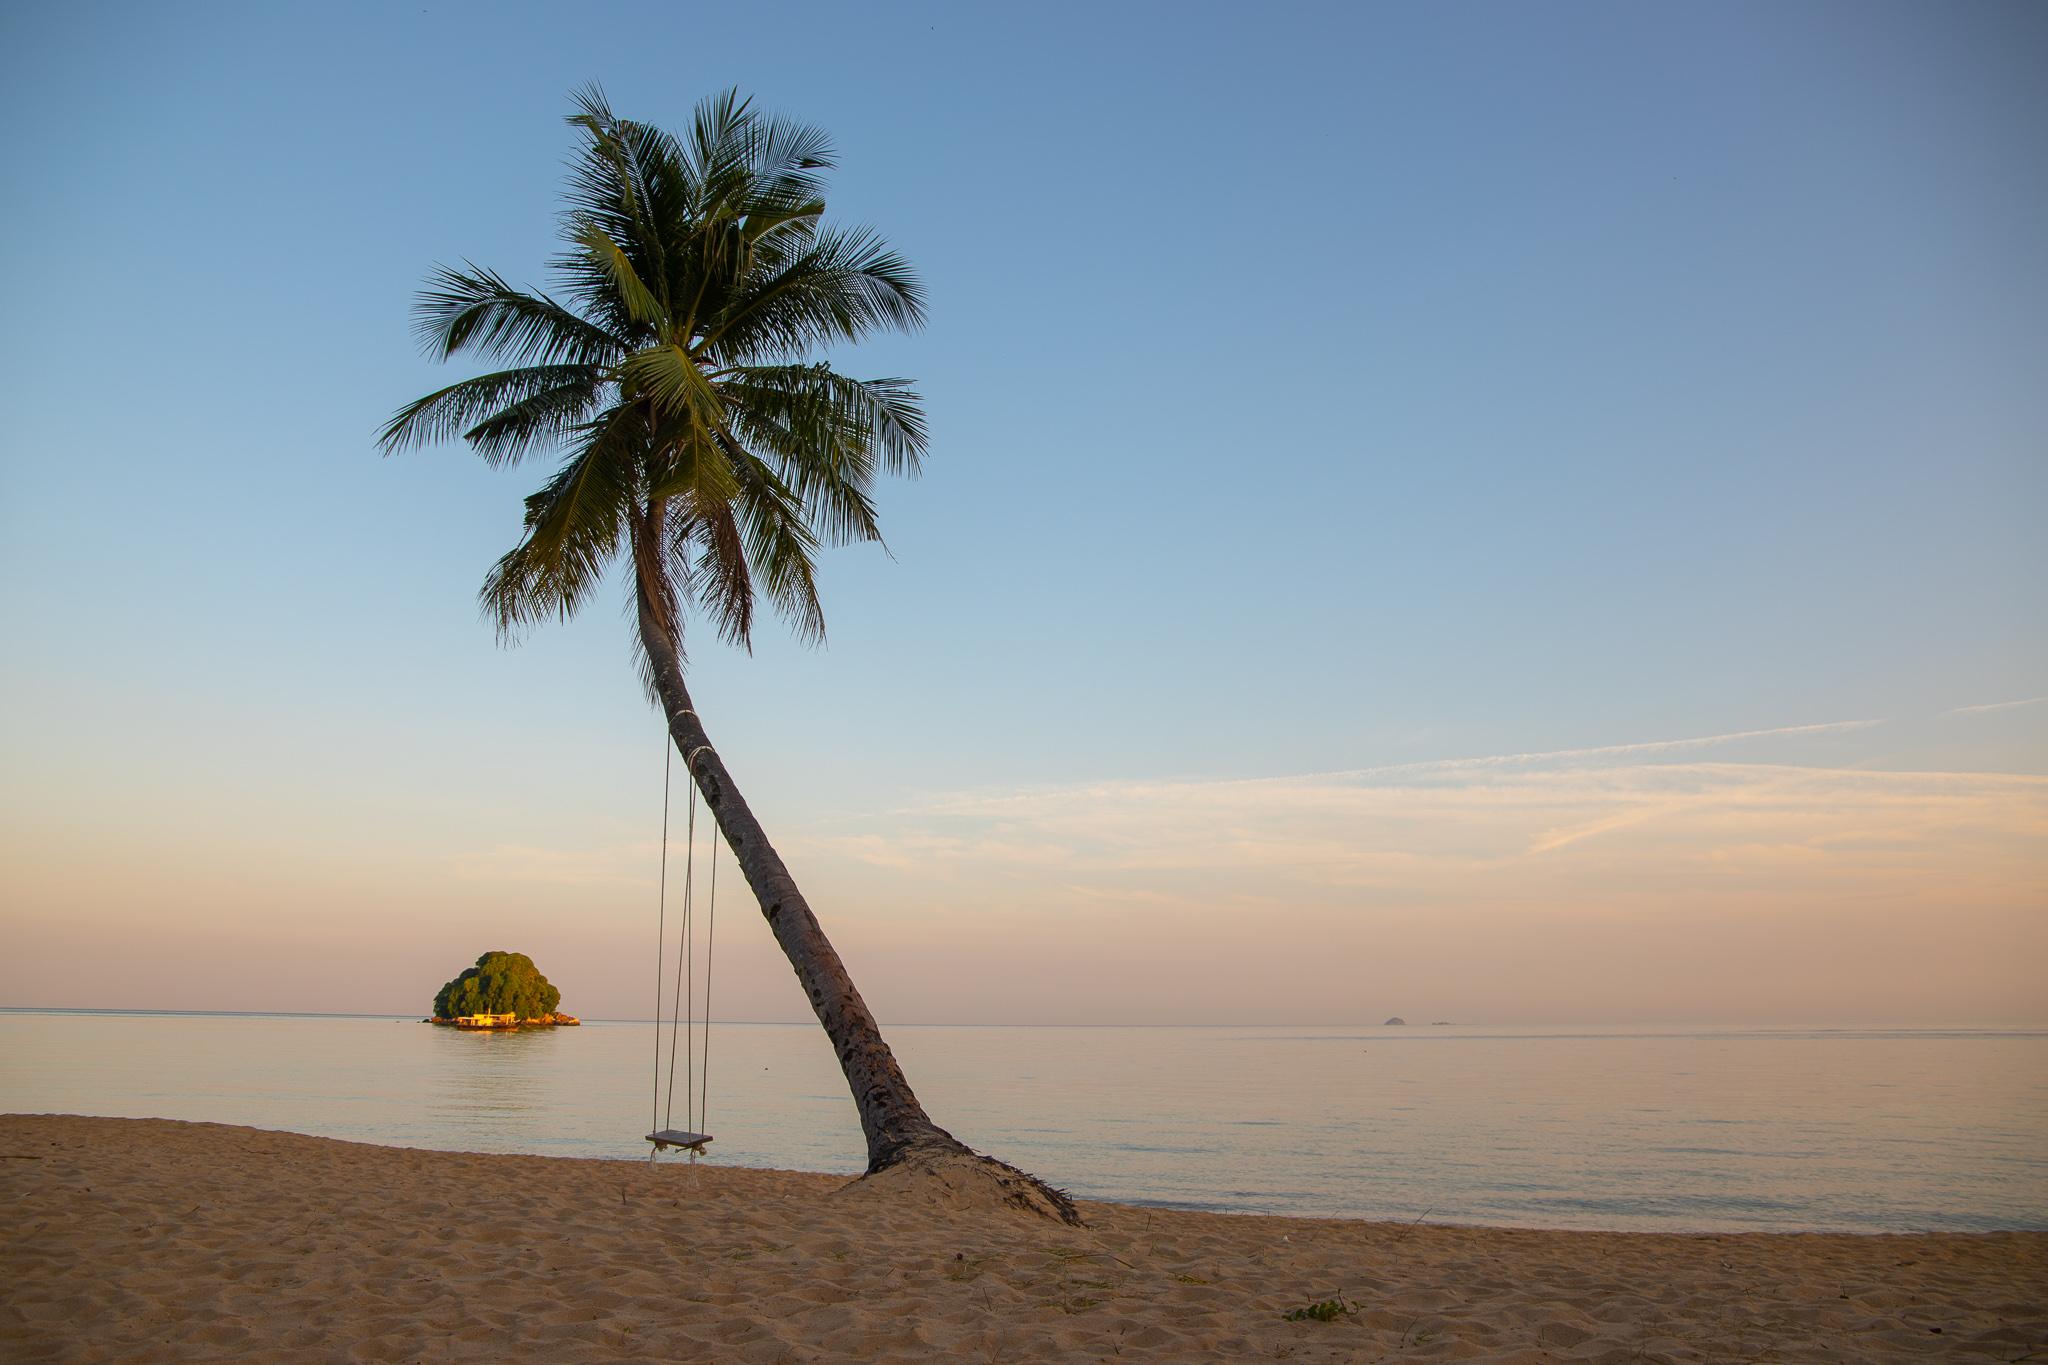 Beach at Berjaya Resort Tioman Island, Malaysia, Malaysia